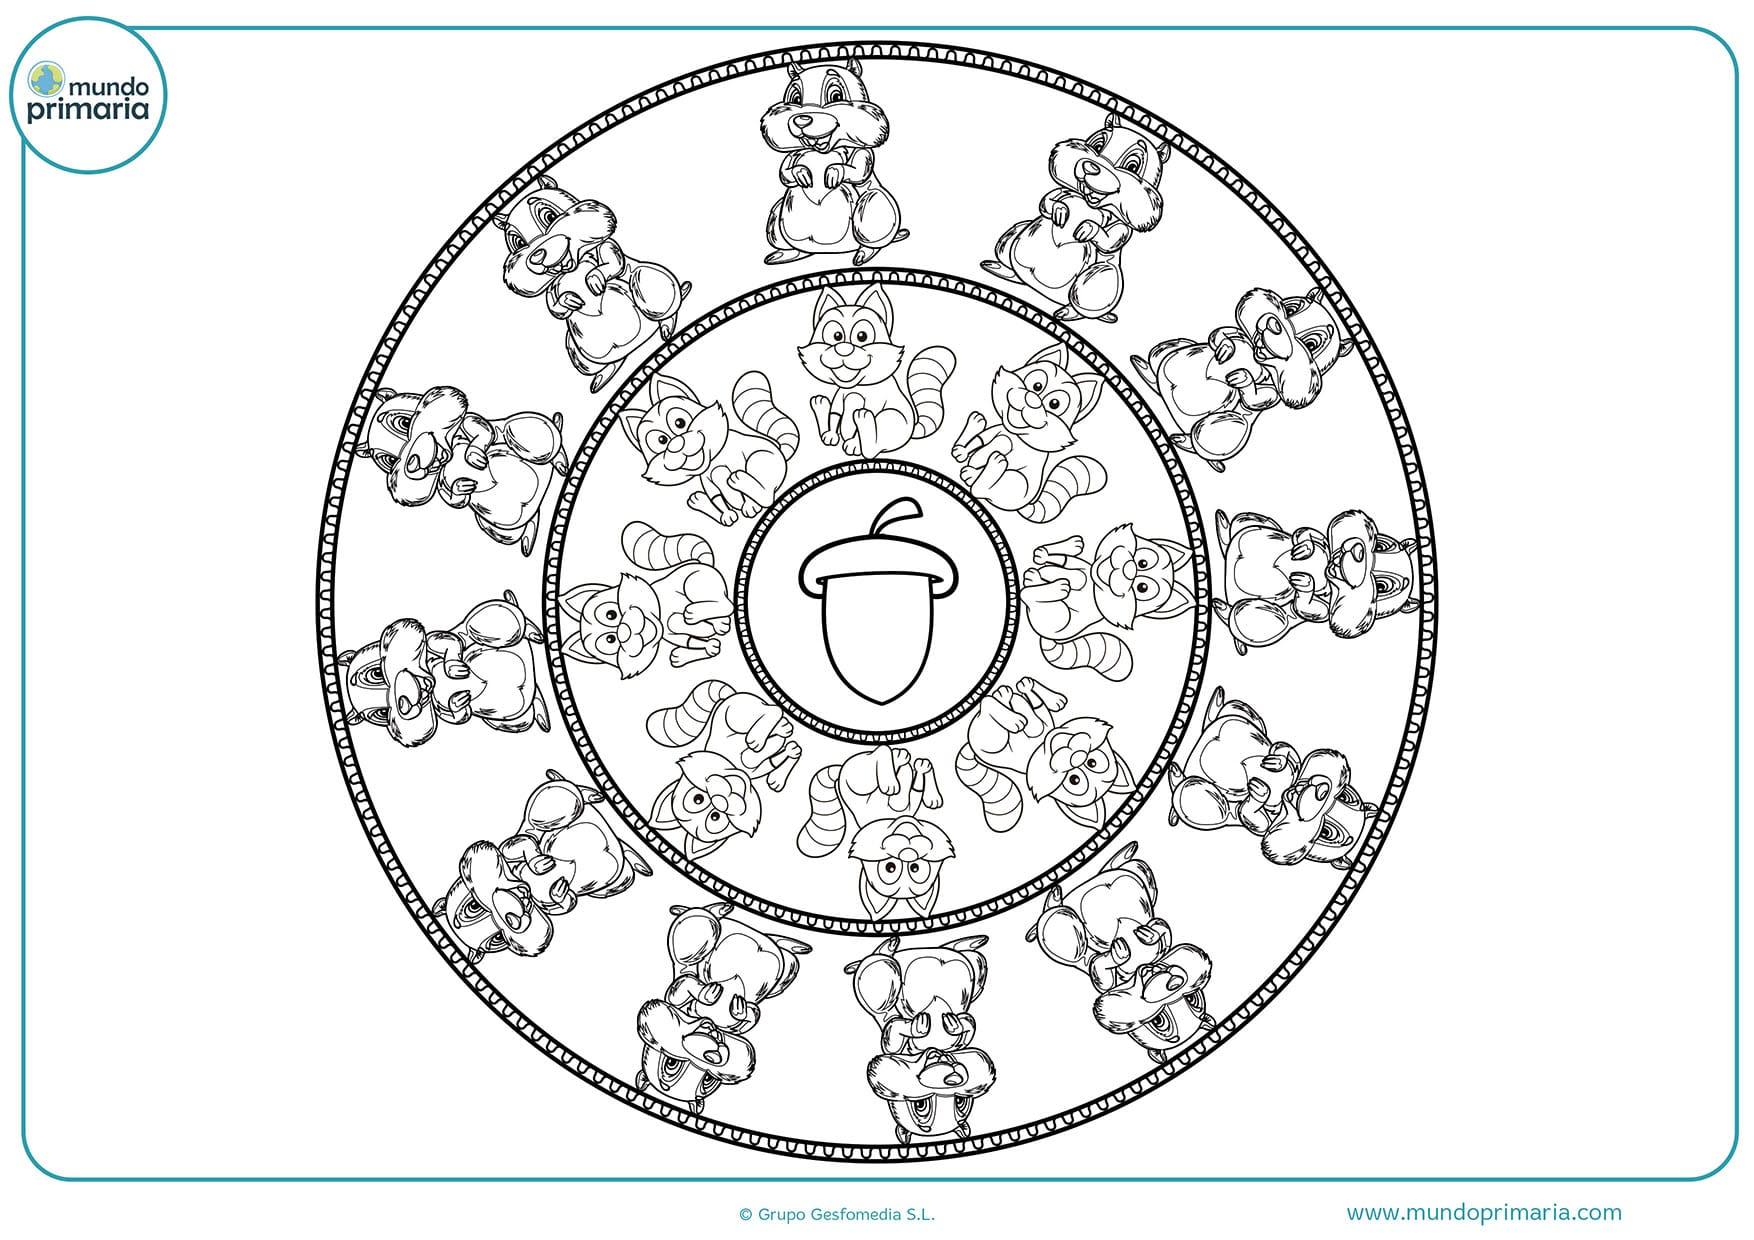 Imagenes De Mandalas Faciles Para Dibujar Para Ninos